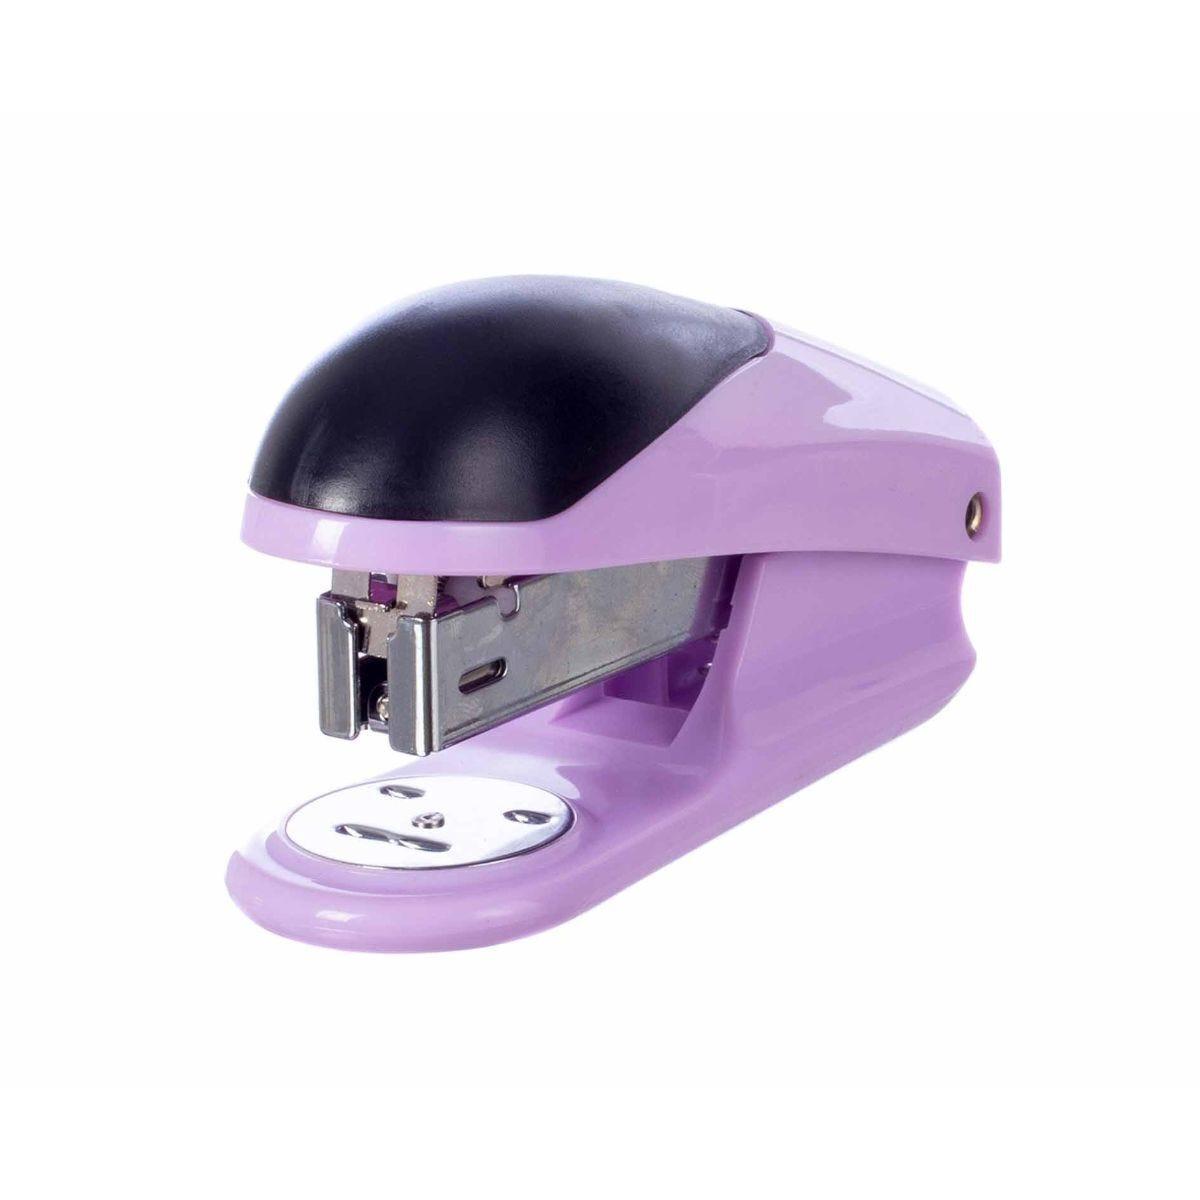 Ryman Pastel Desk Stapler Lilac